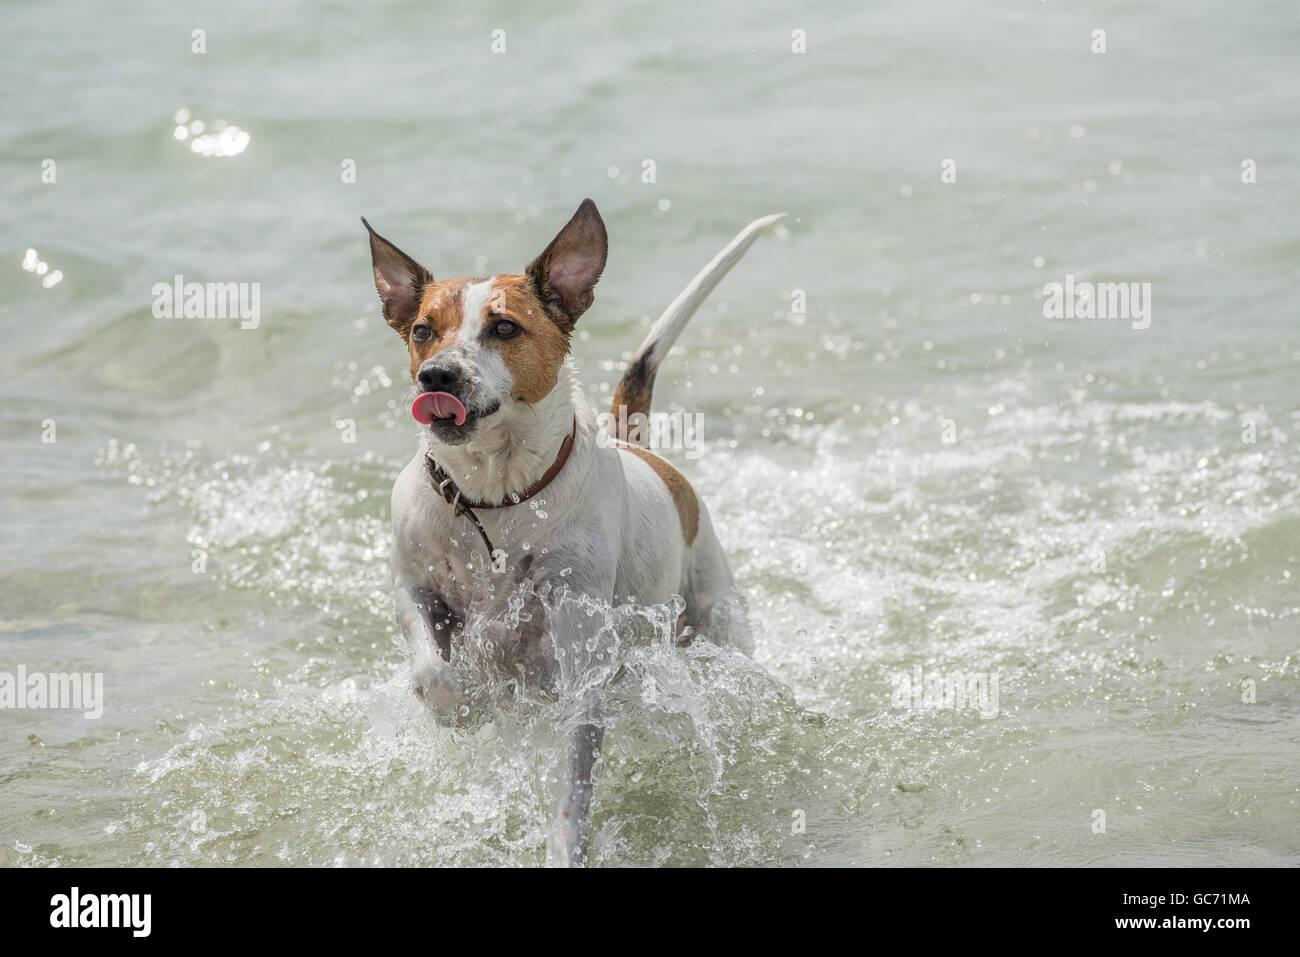 Danish-Swedish Farmdog playing fetch. - Stock Image